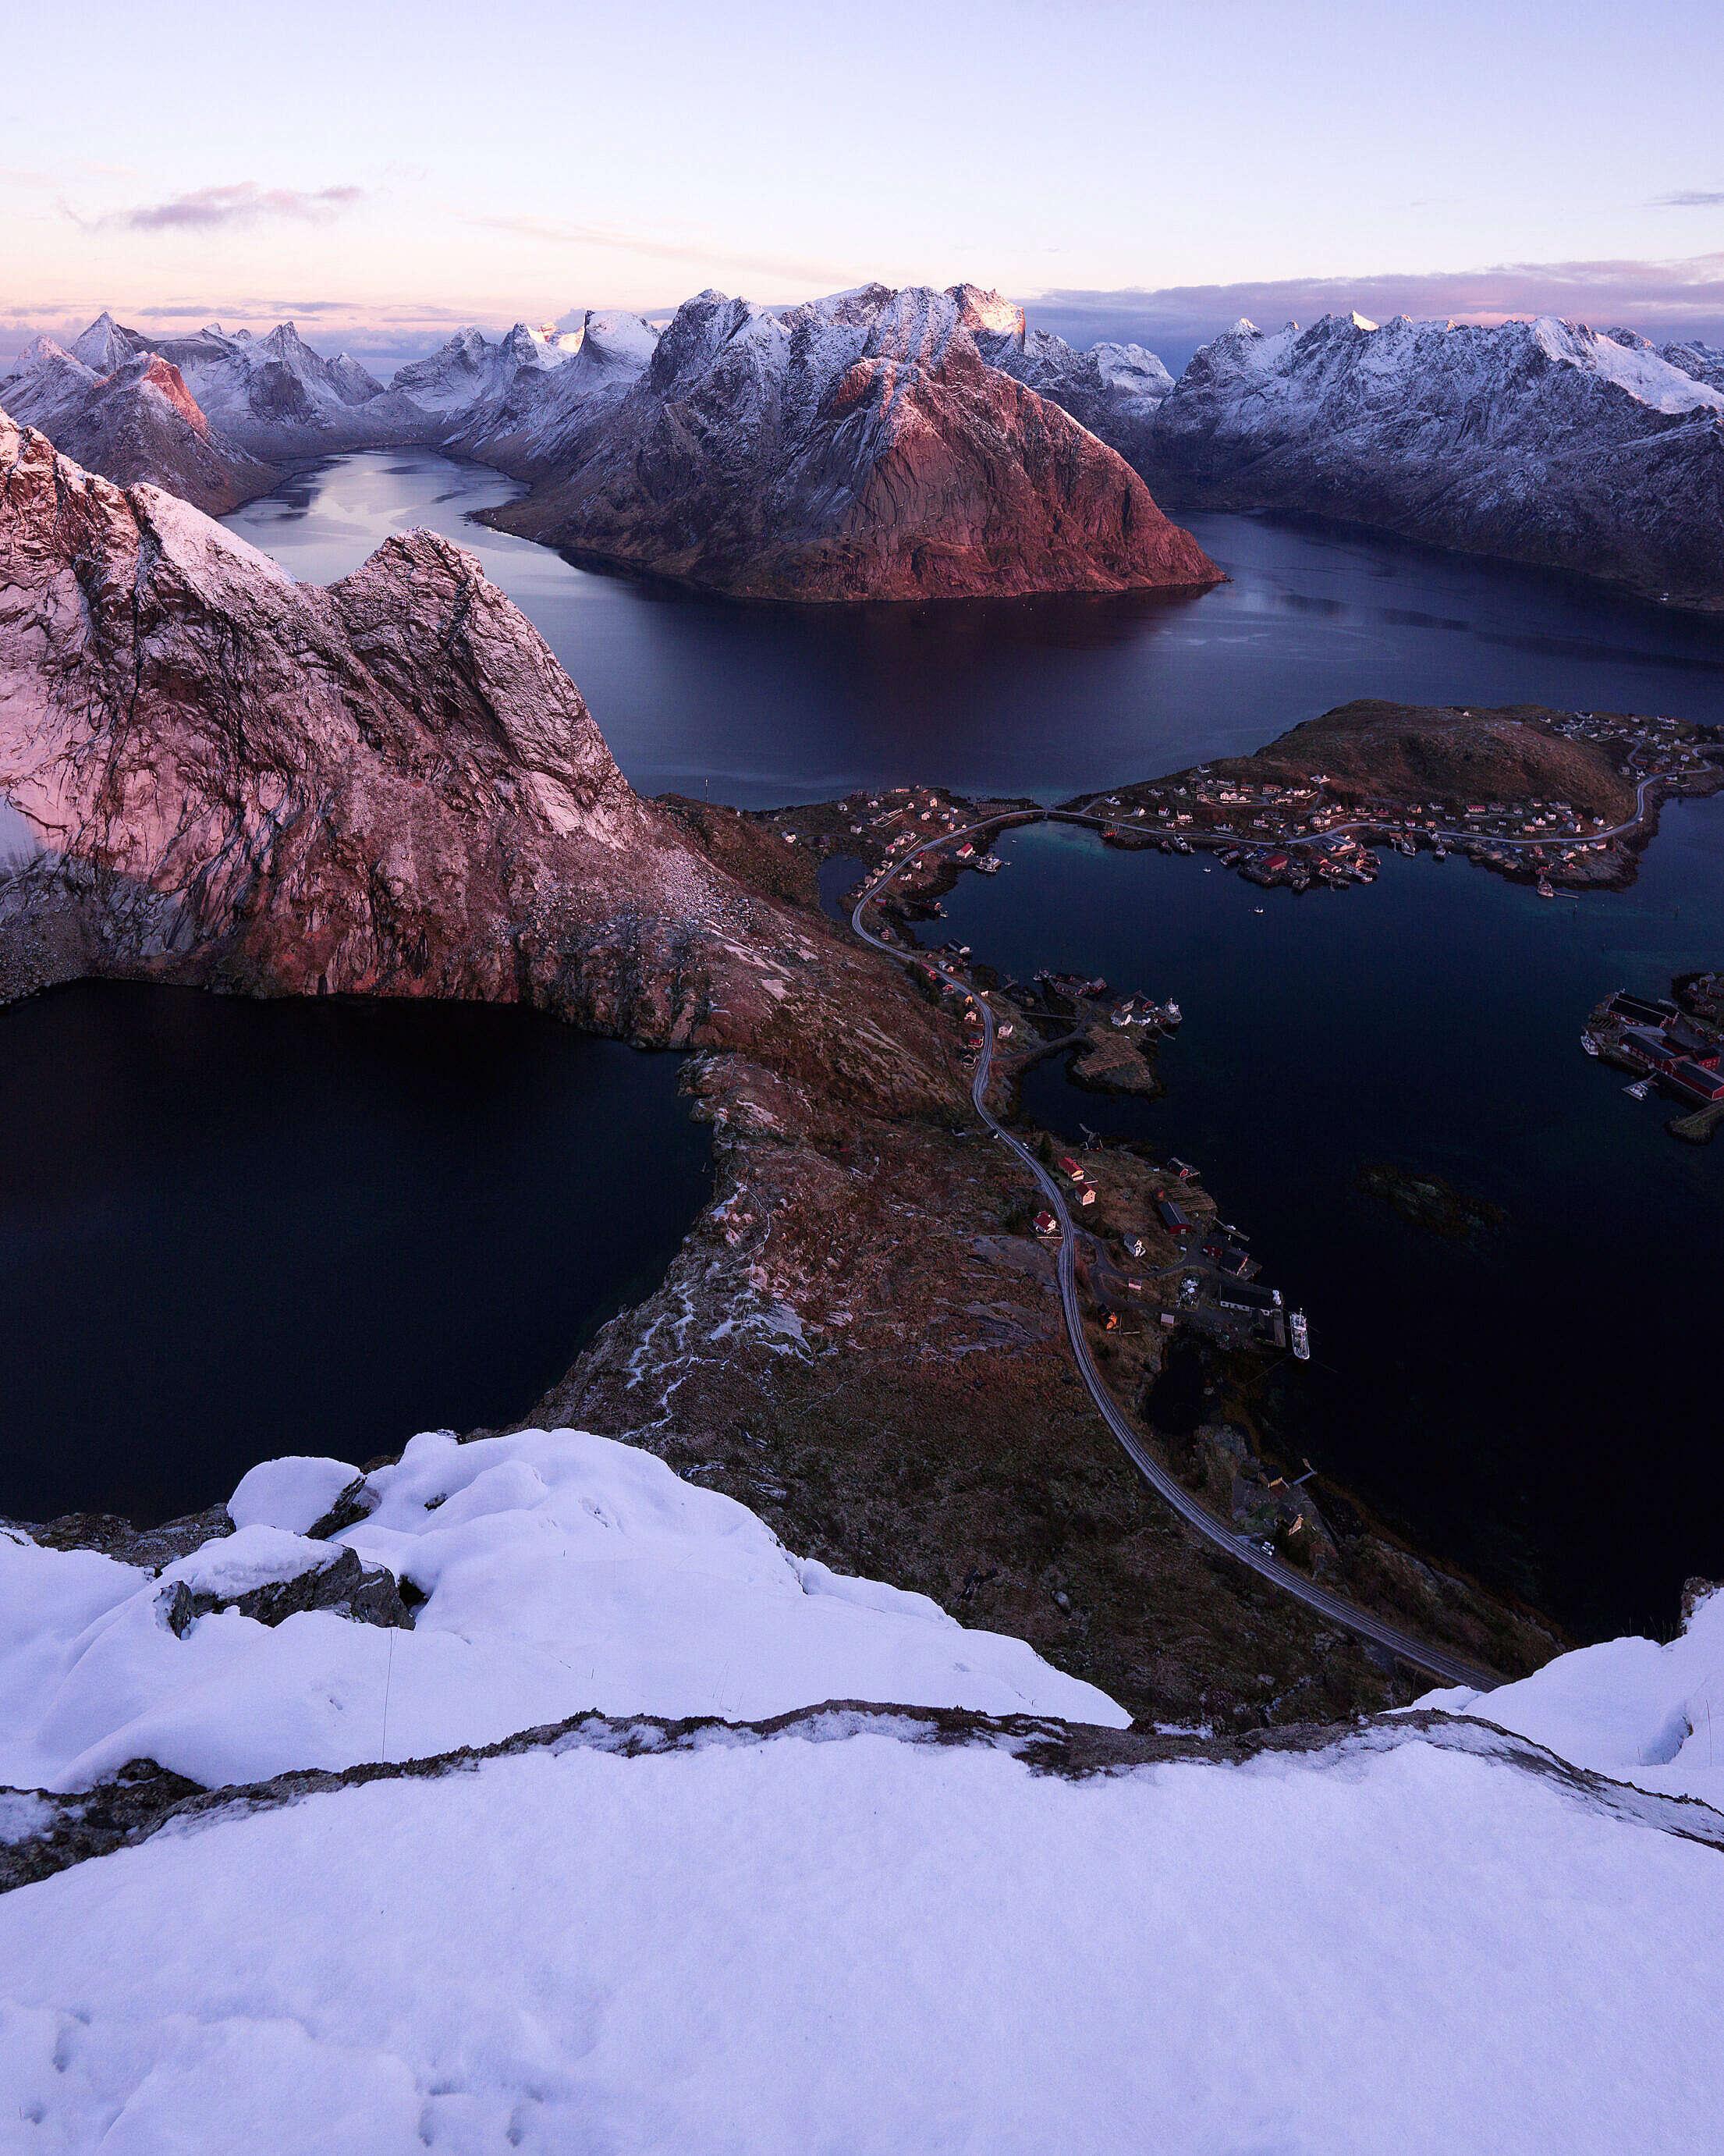 Winter Sunrise Glow at Lofoten Islands in Norway Free Stock Photo